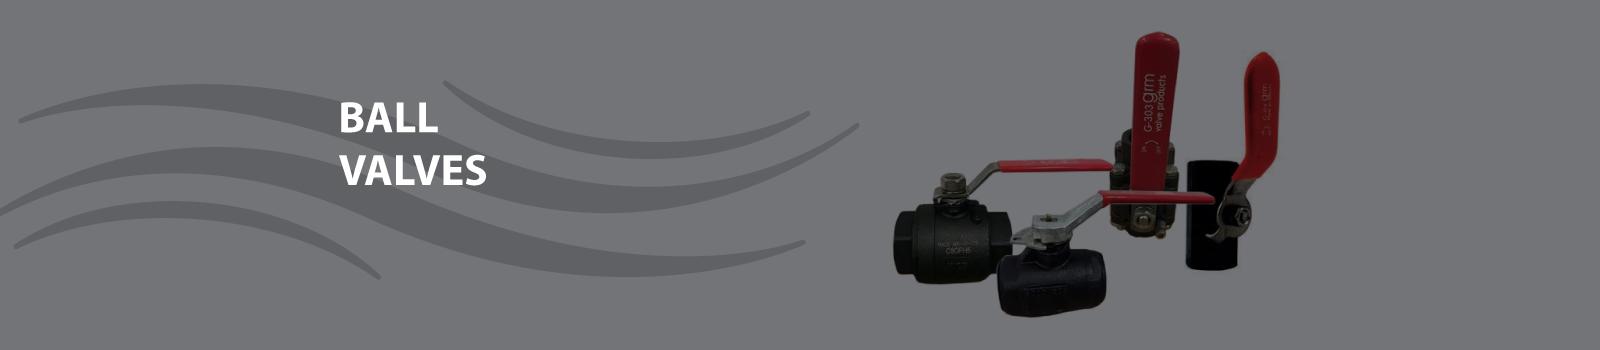 ball valve banner